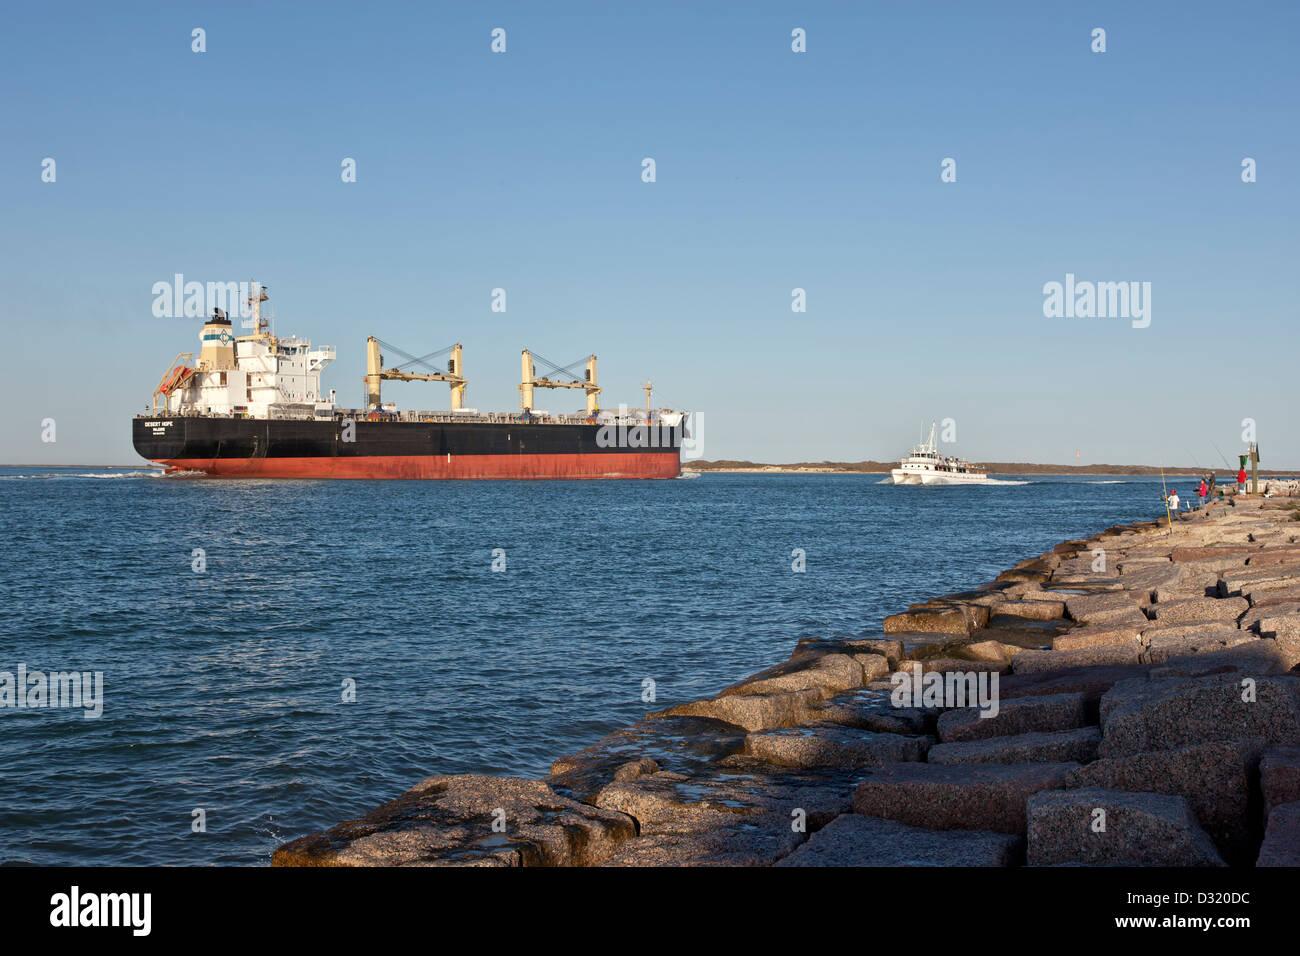 Freighter transporting grain, Corpus Christi ship channel. Stock Photo